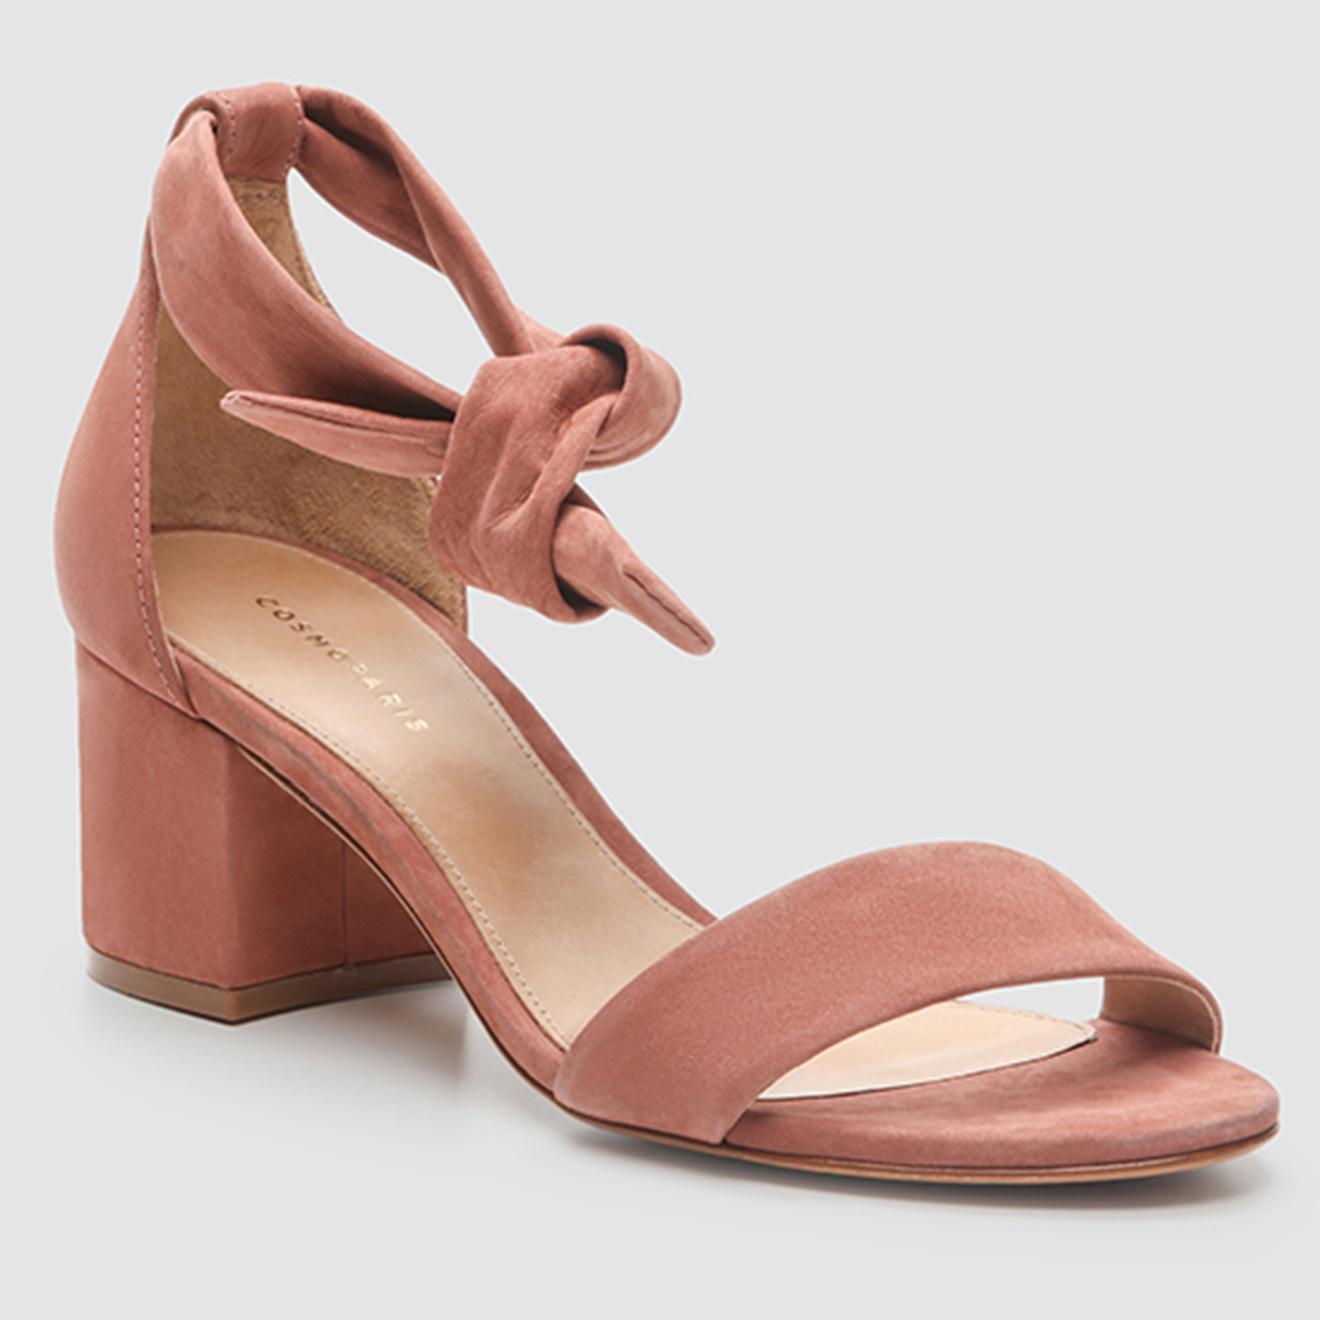 Sandales en Velours de Cuir Ayane - Cosmoparis - Modalova